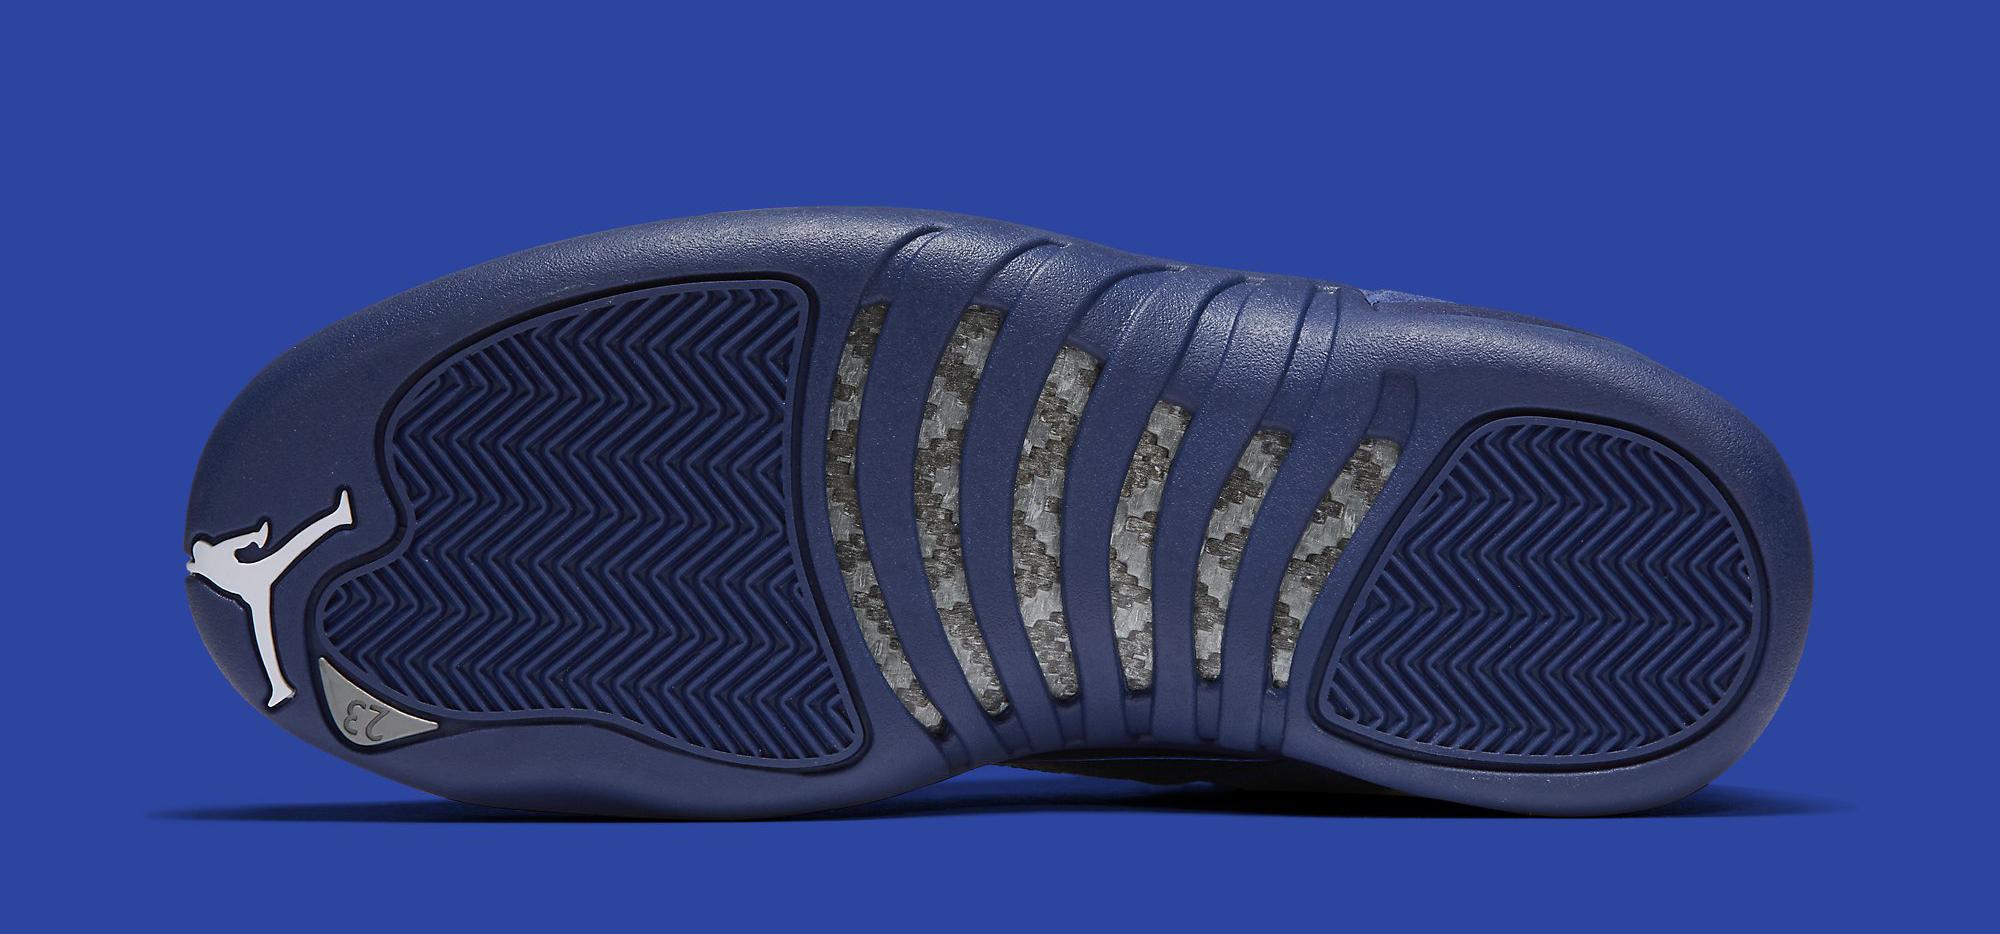 Blue Jordan 12 Sole